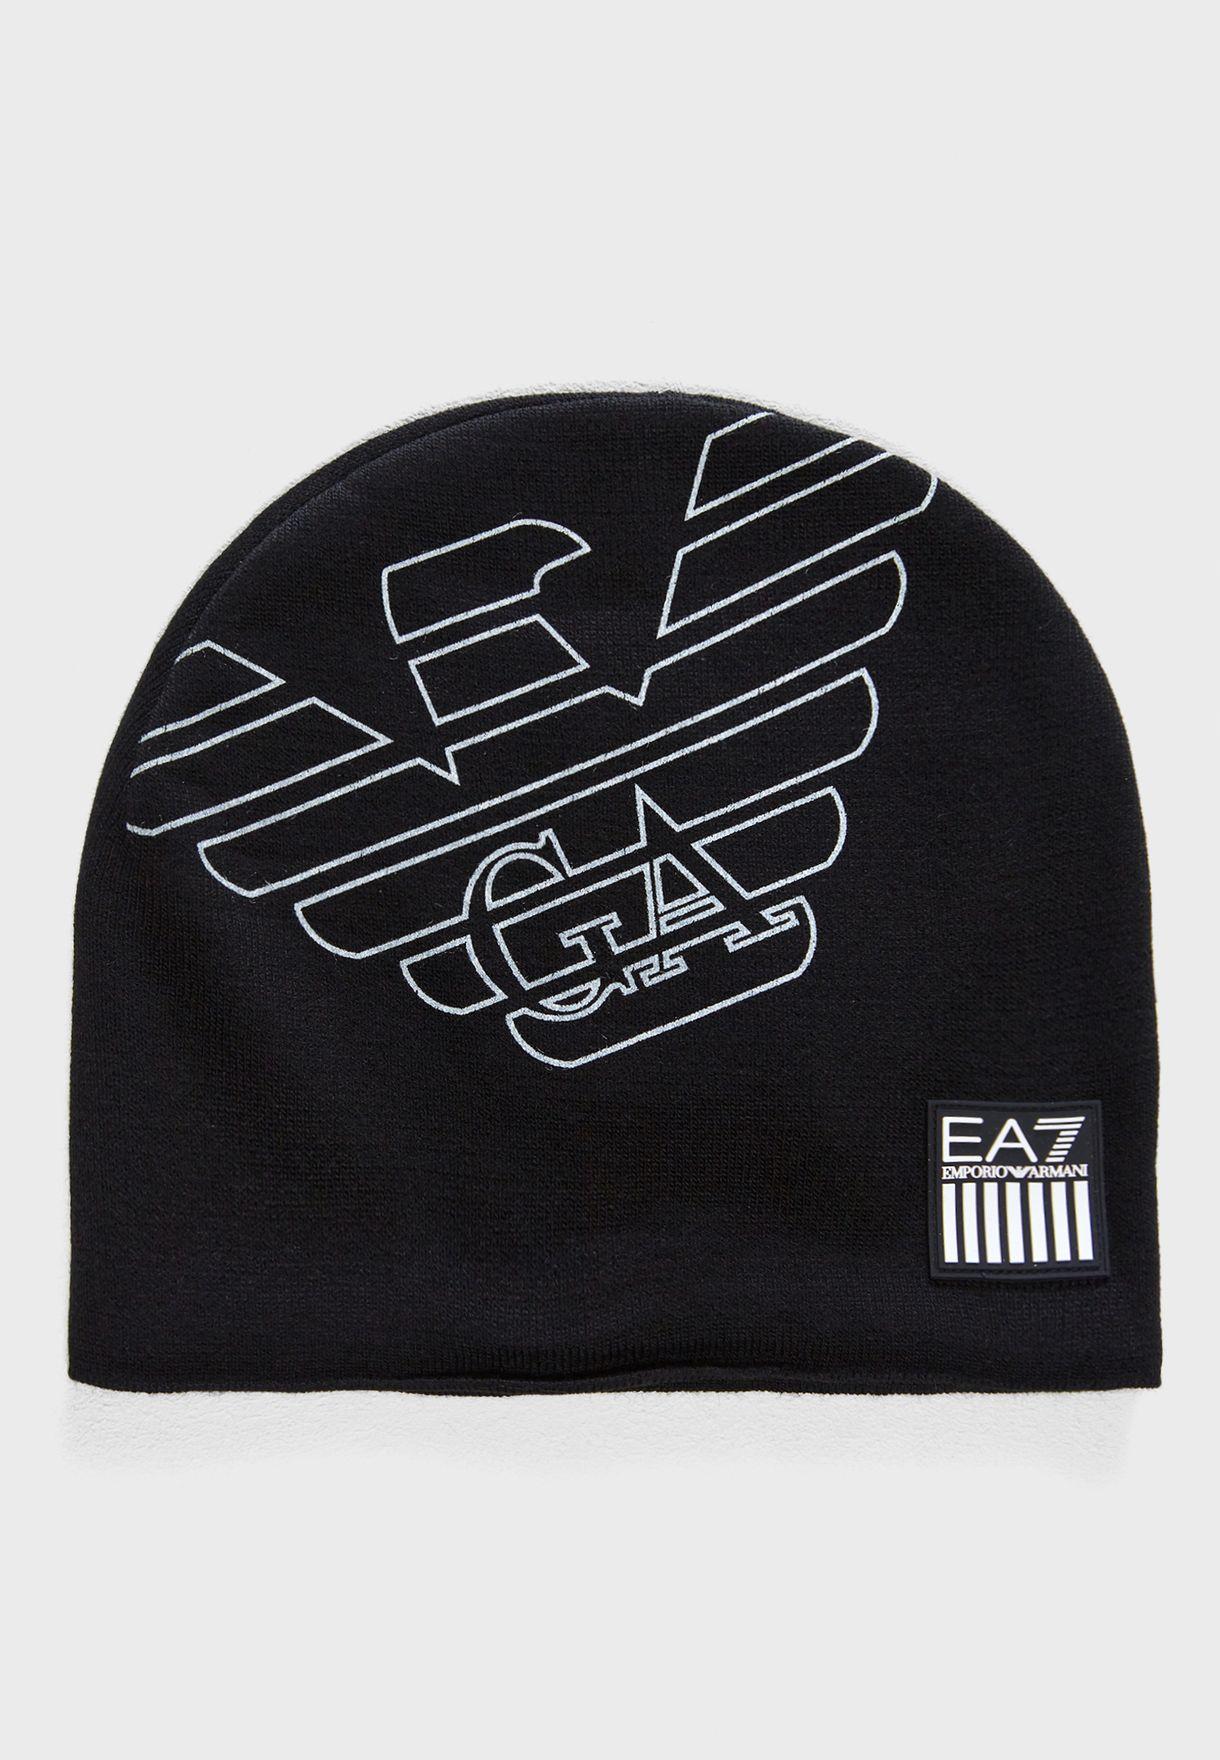 4b701b6d236fa Shop Ea7 Emporio Armani black Logo Beanie 8A302-275803-00020 for Men ...